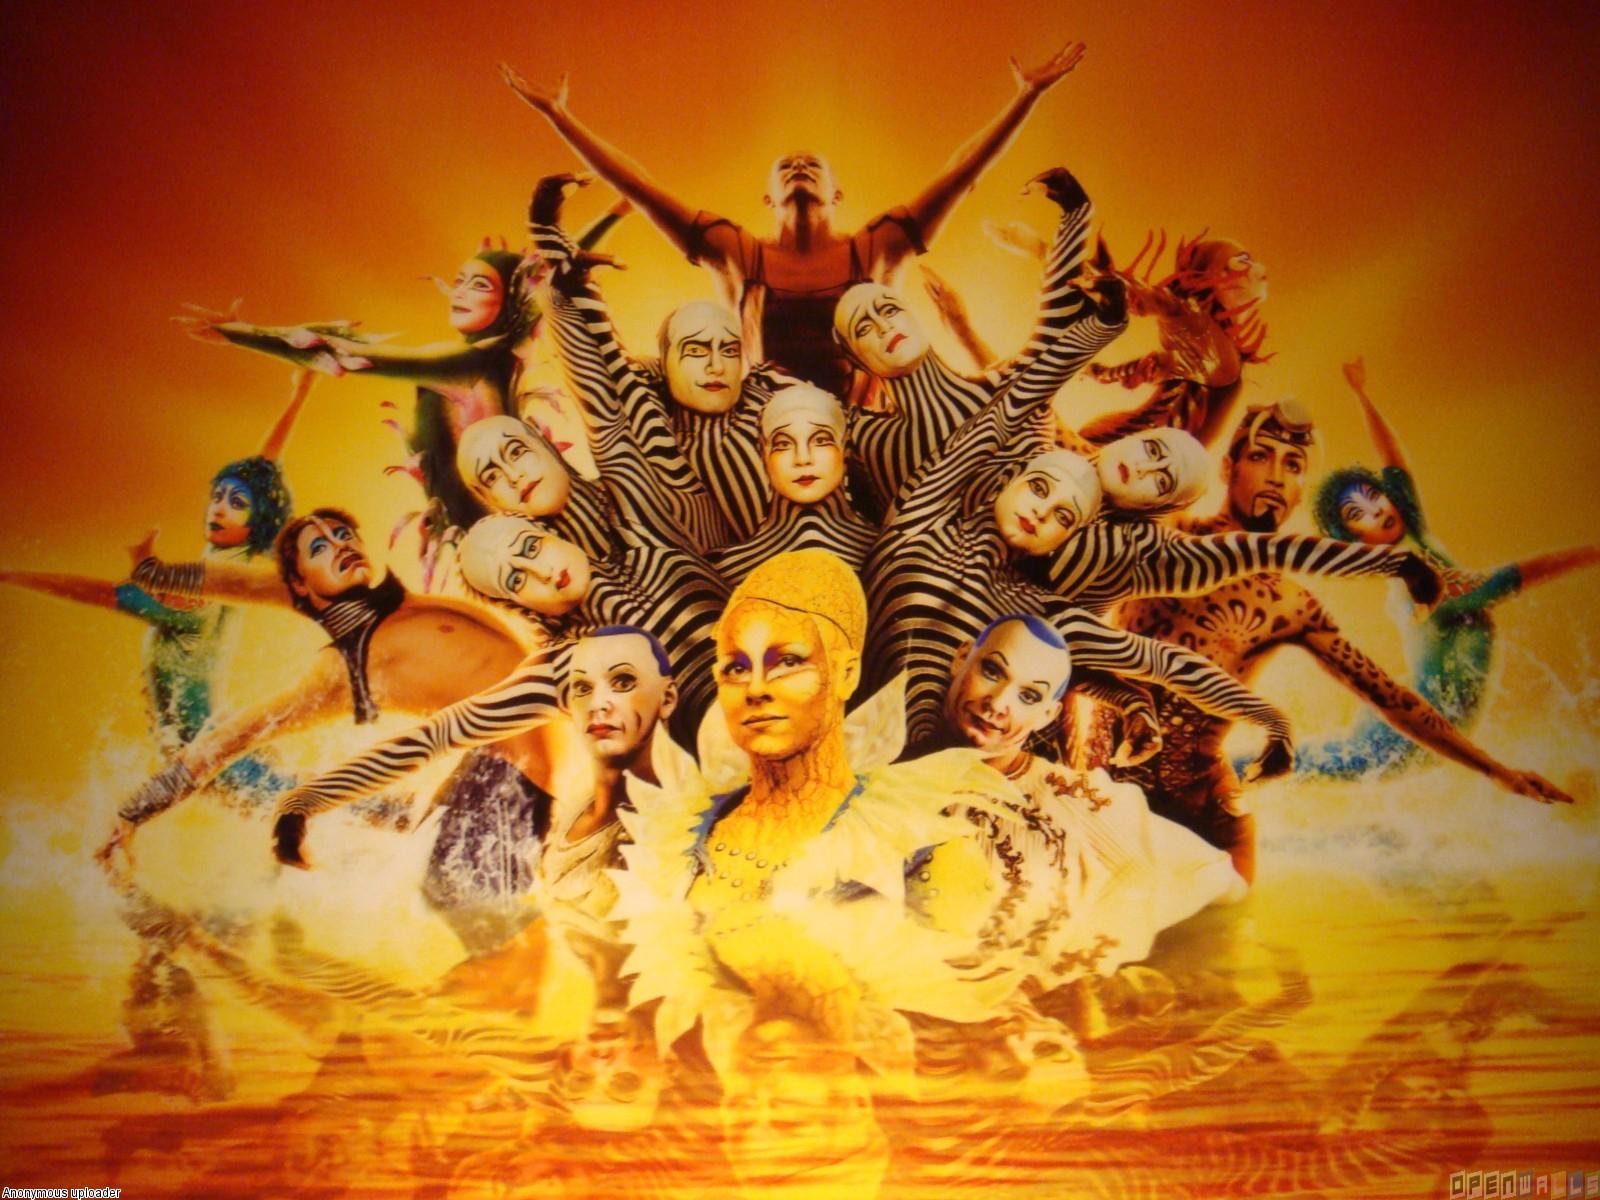 Killzone Shadow Fall Wallpapers Hd Wallpapers Hd Cirque Du Soleil Fondos De Pantalla